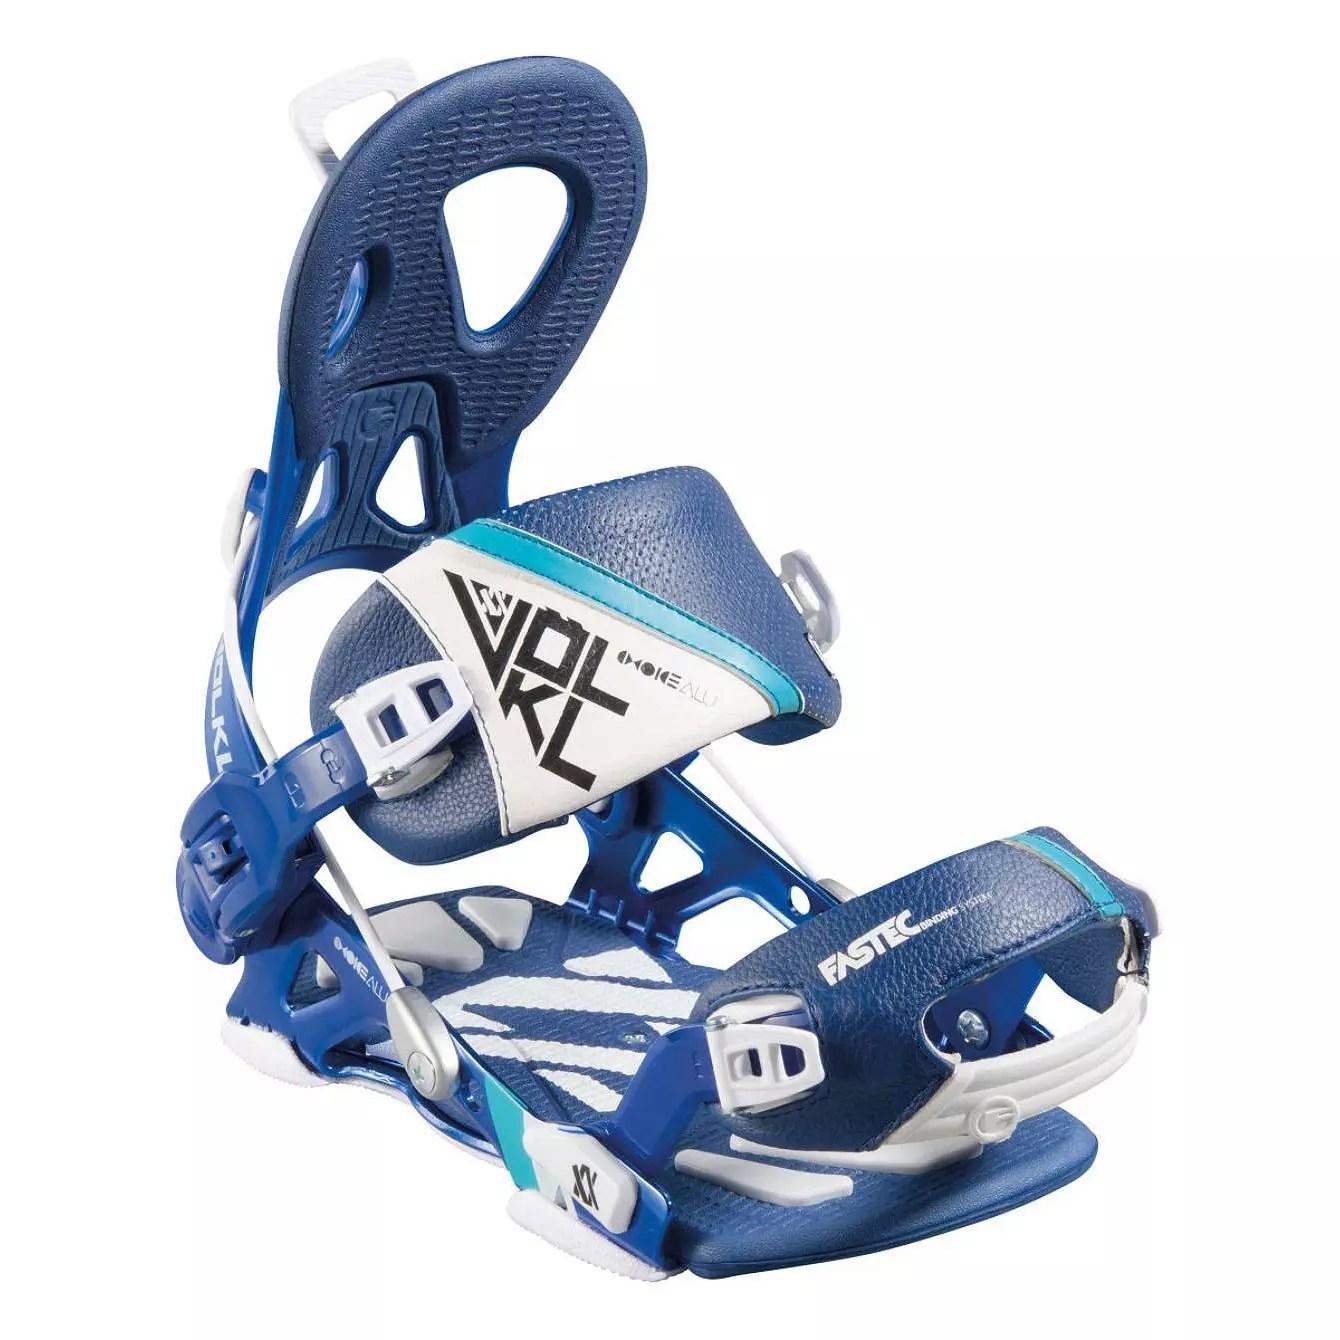 Volkl Fastec Choice Alu 2016 (Blue)